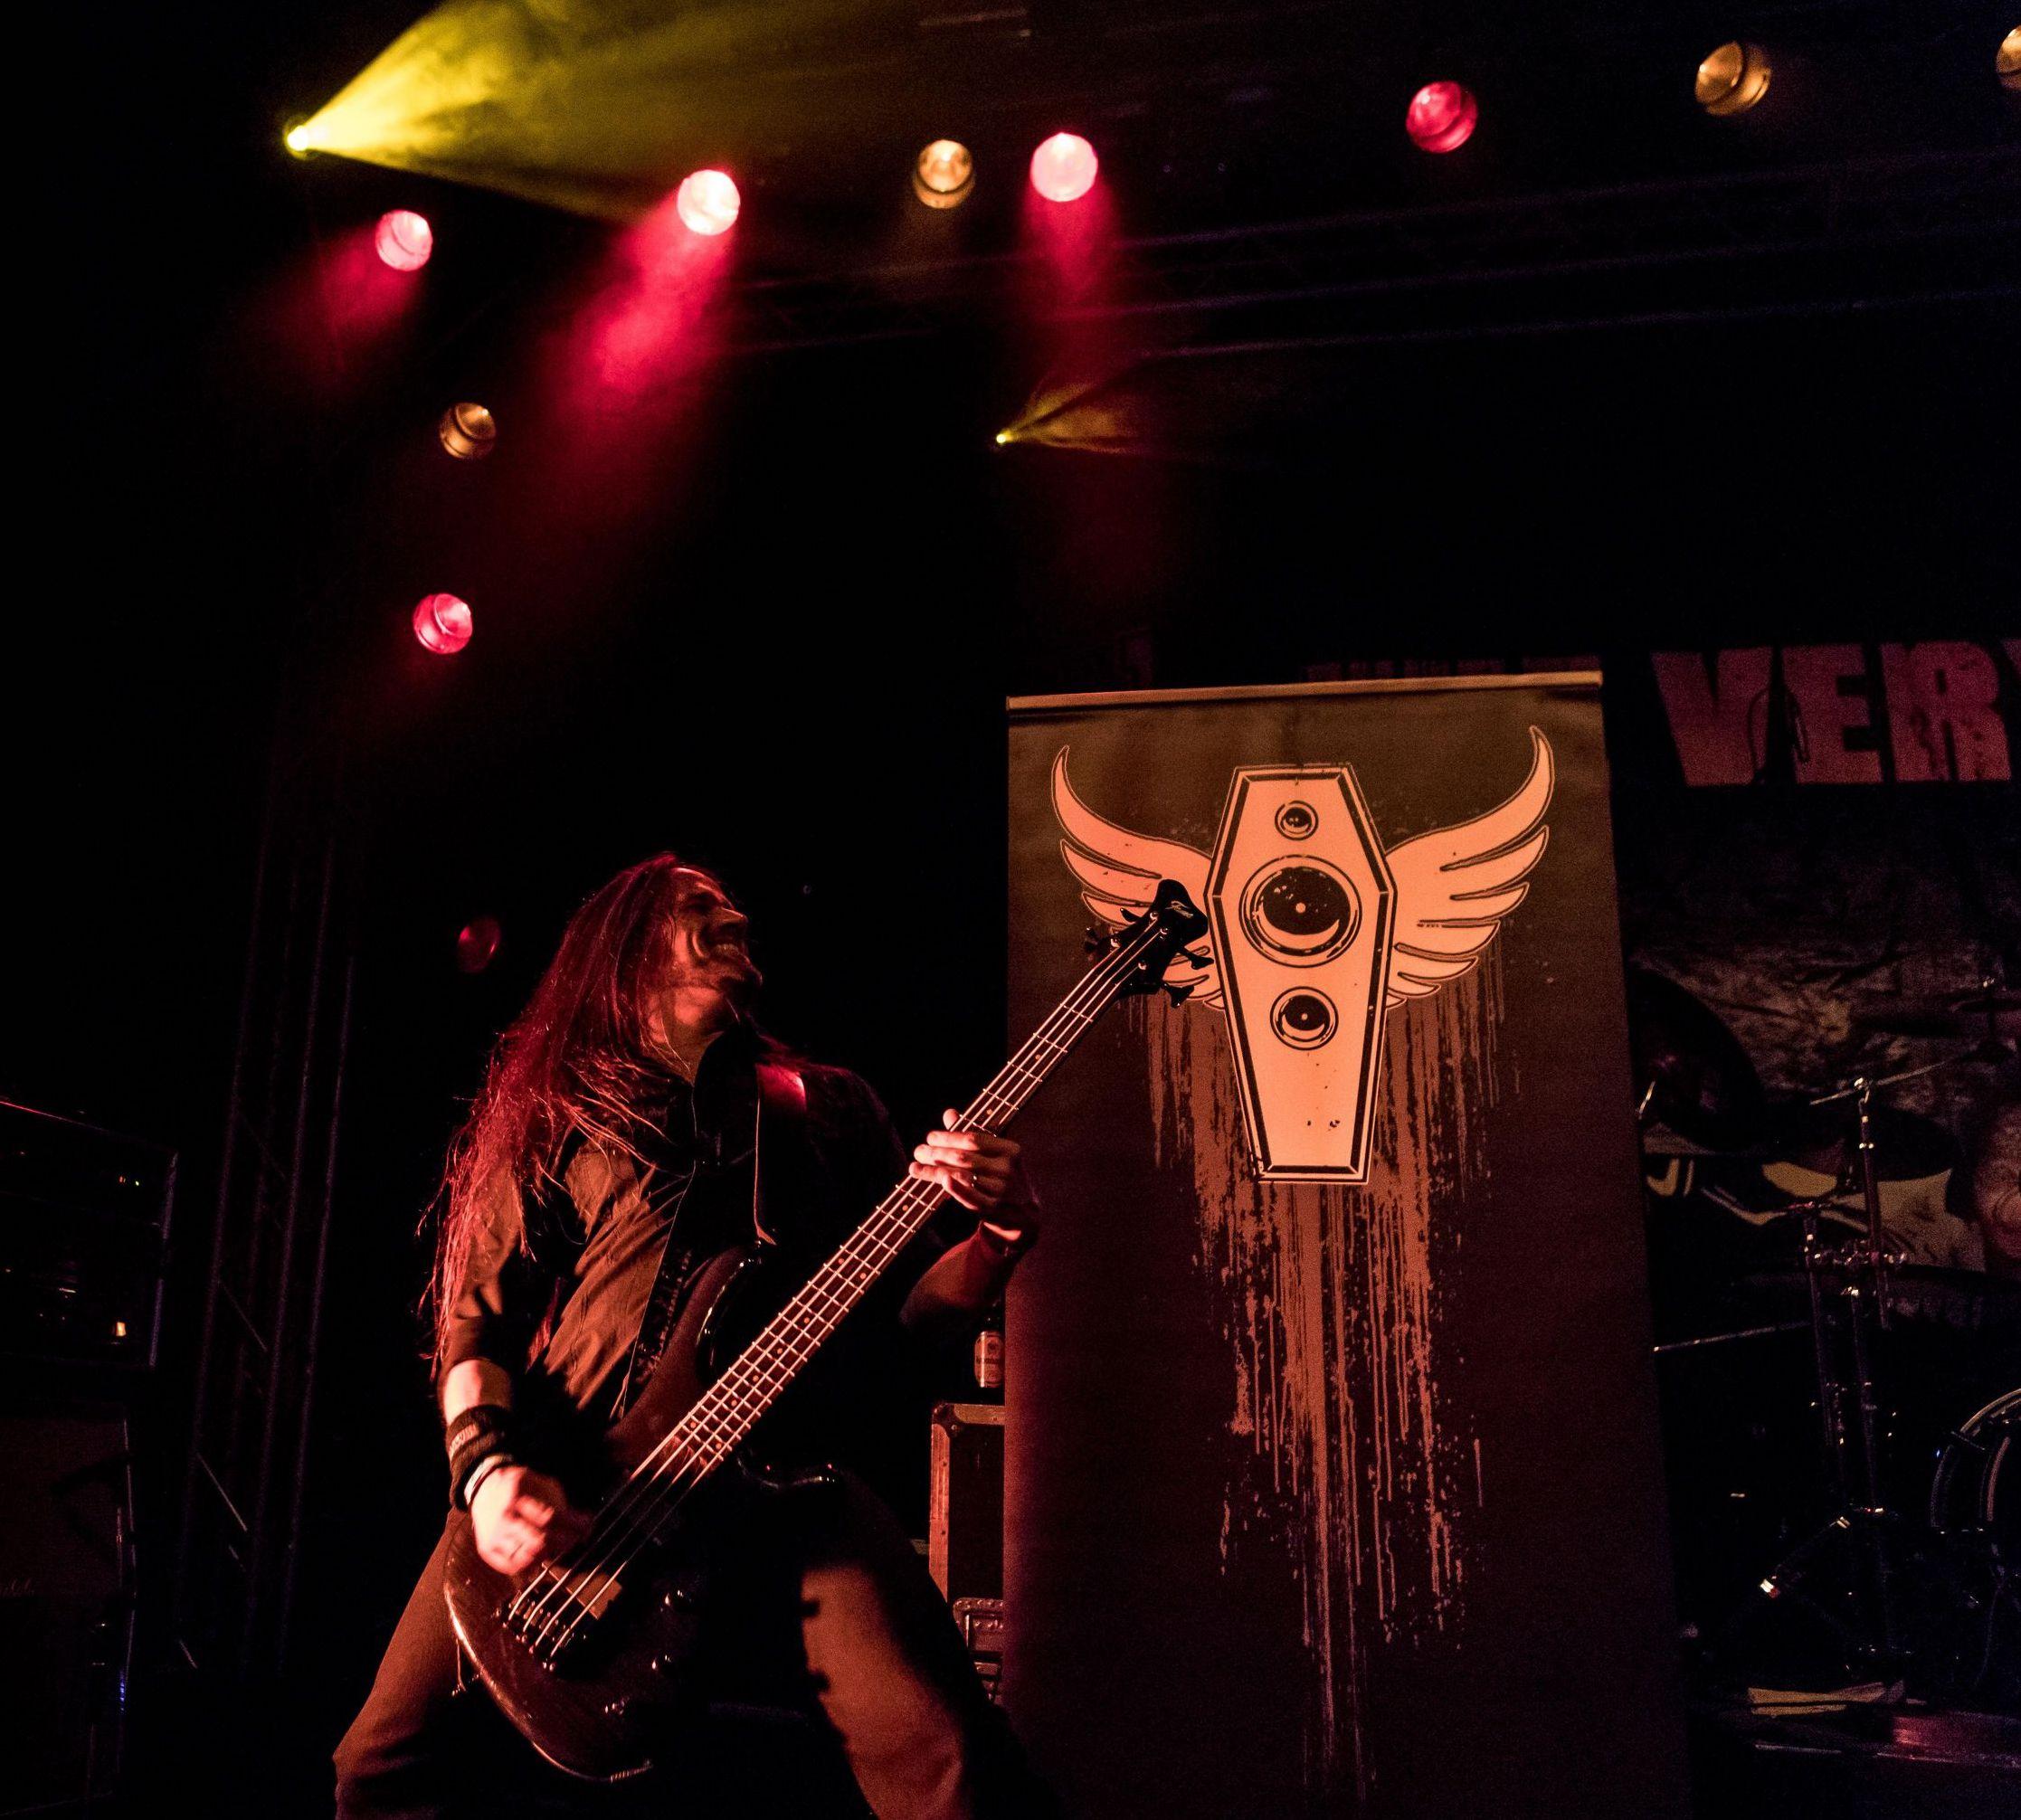 the-very-end-live-zeche-carl-essen-germany-thrash-metal_10